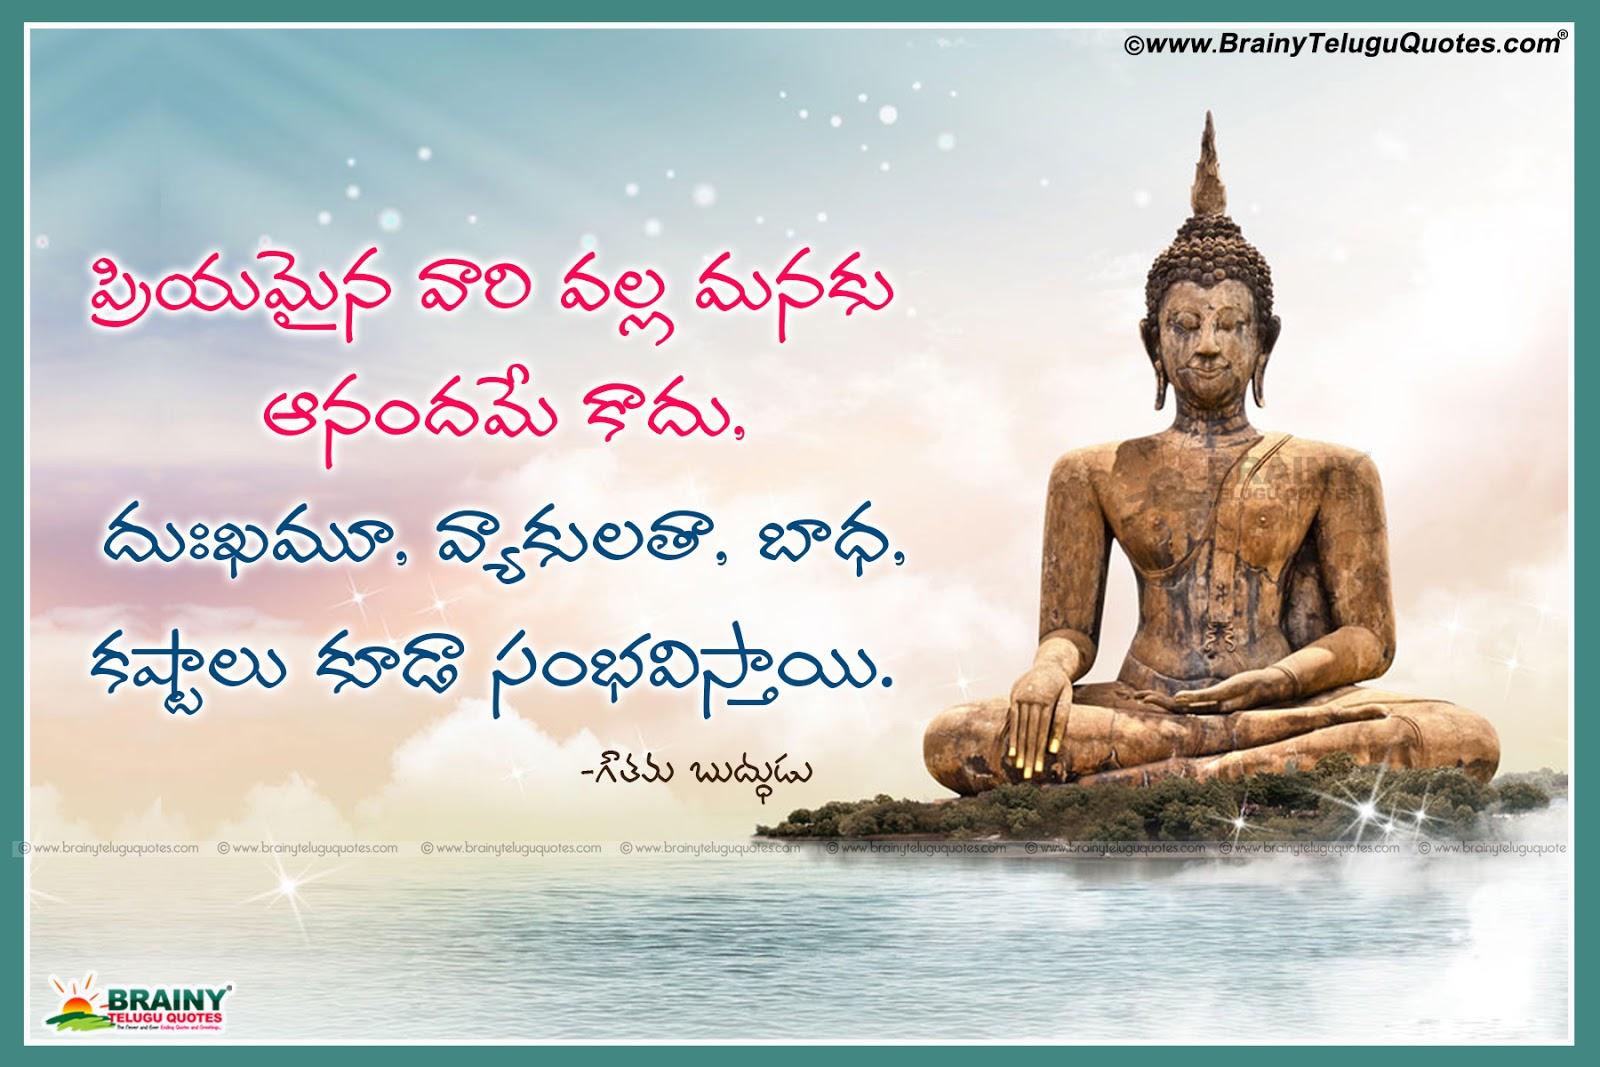 Gautama Buddha Quotes Great Quotes And Saying Of Gautama Buddha In Telugu With Images